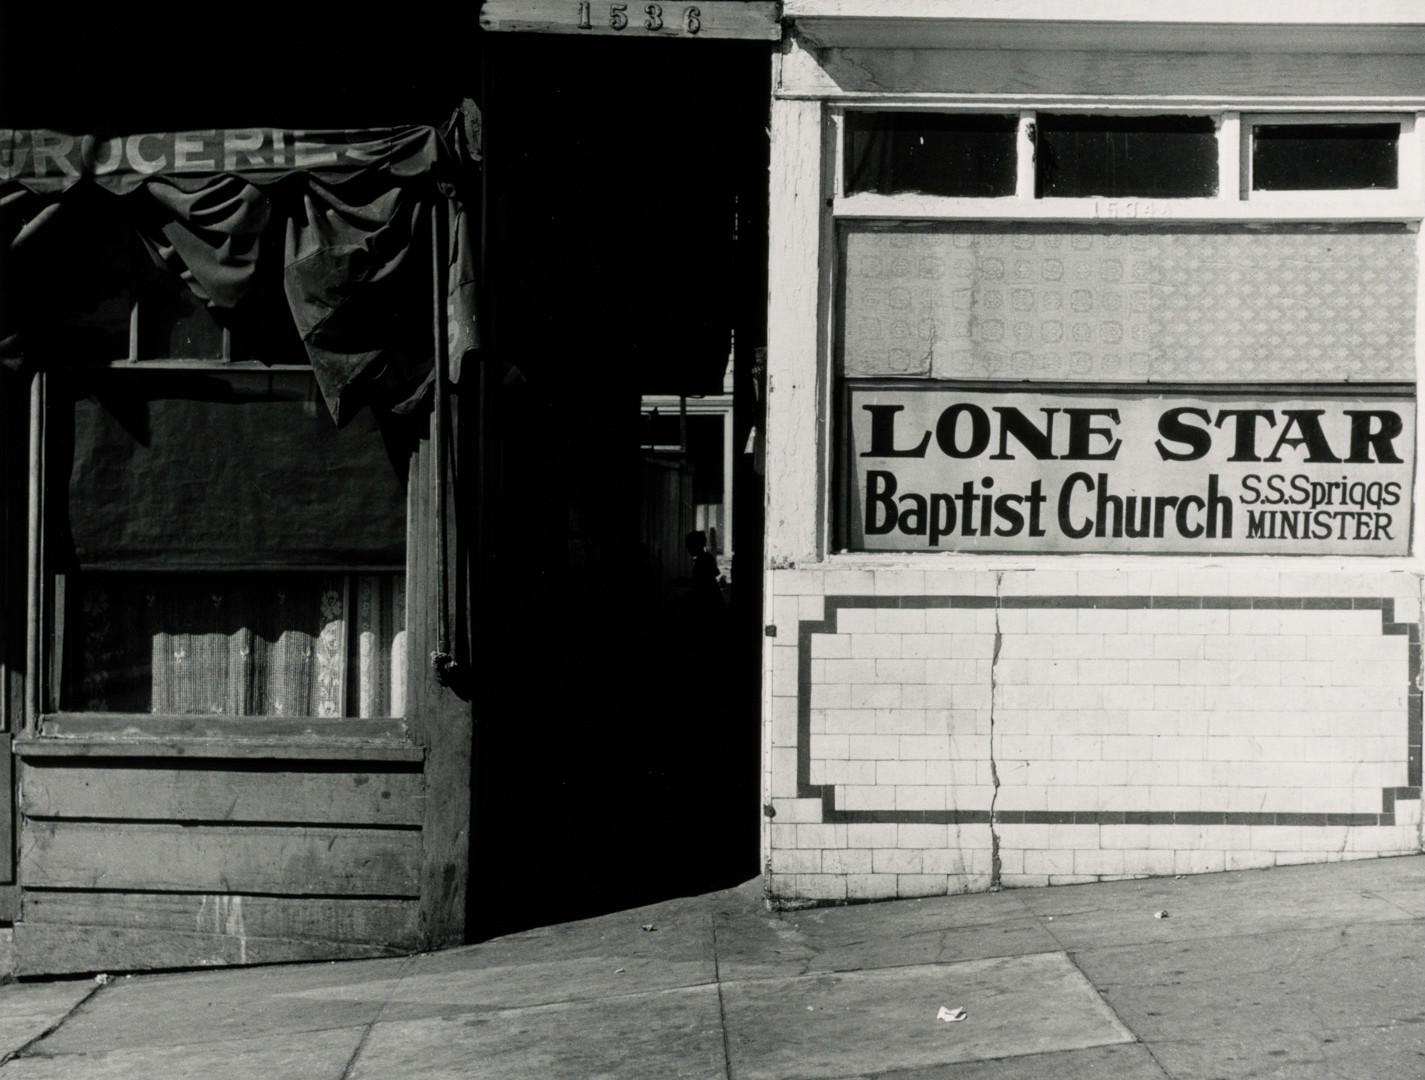 Irving Penn, Lone Star Baptist Church, San Francisco, 1947